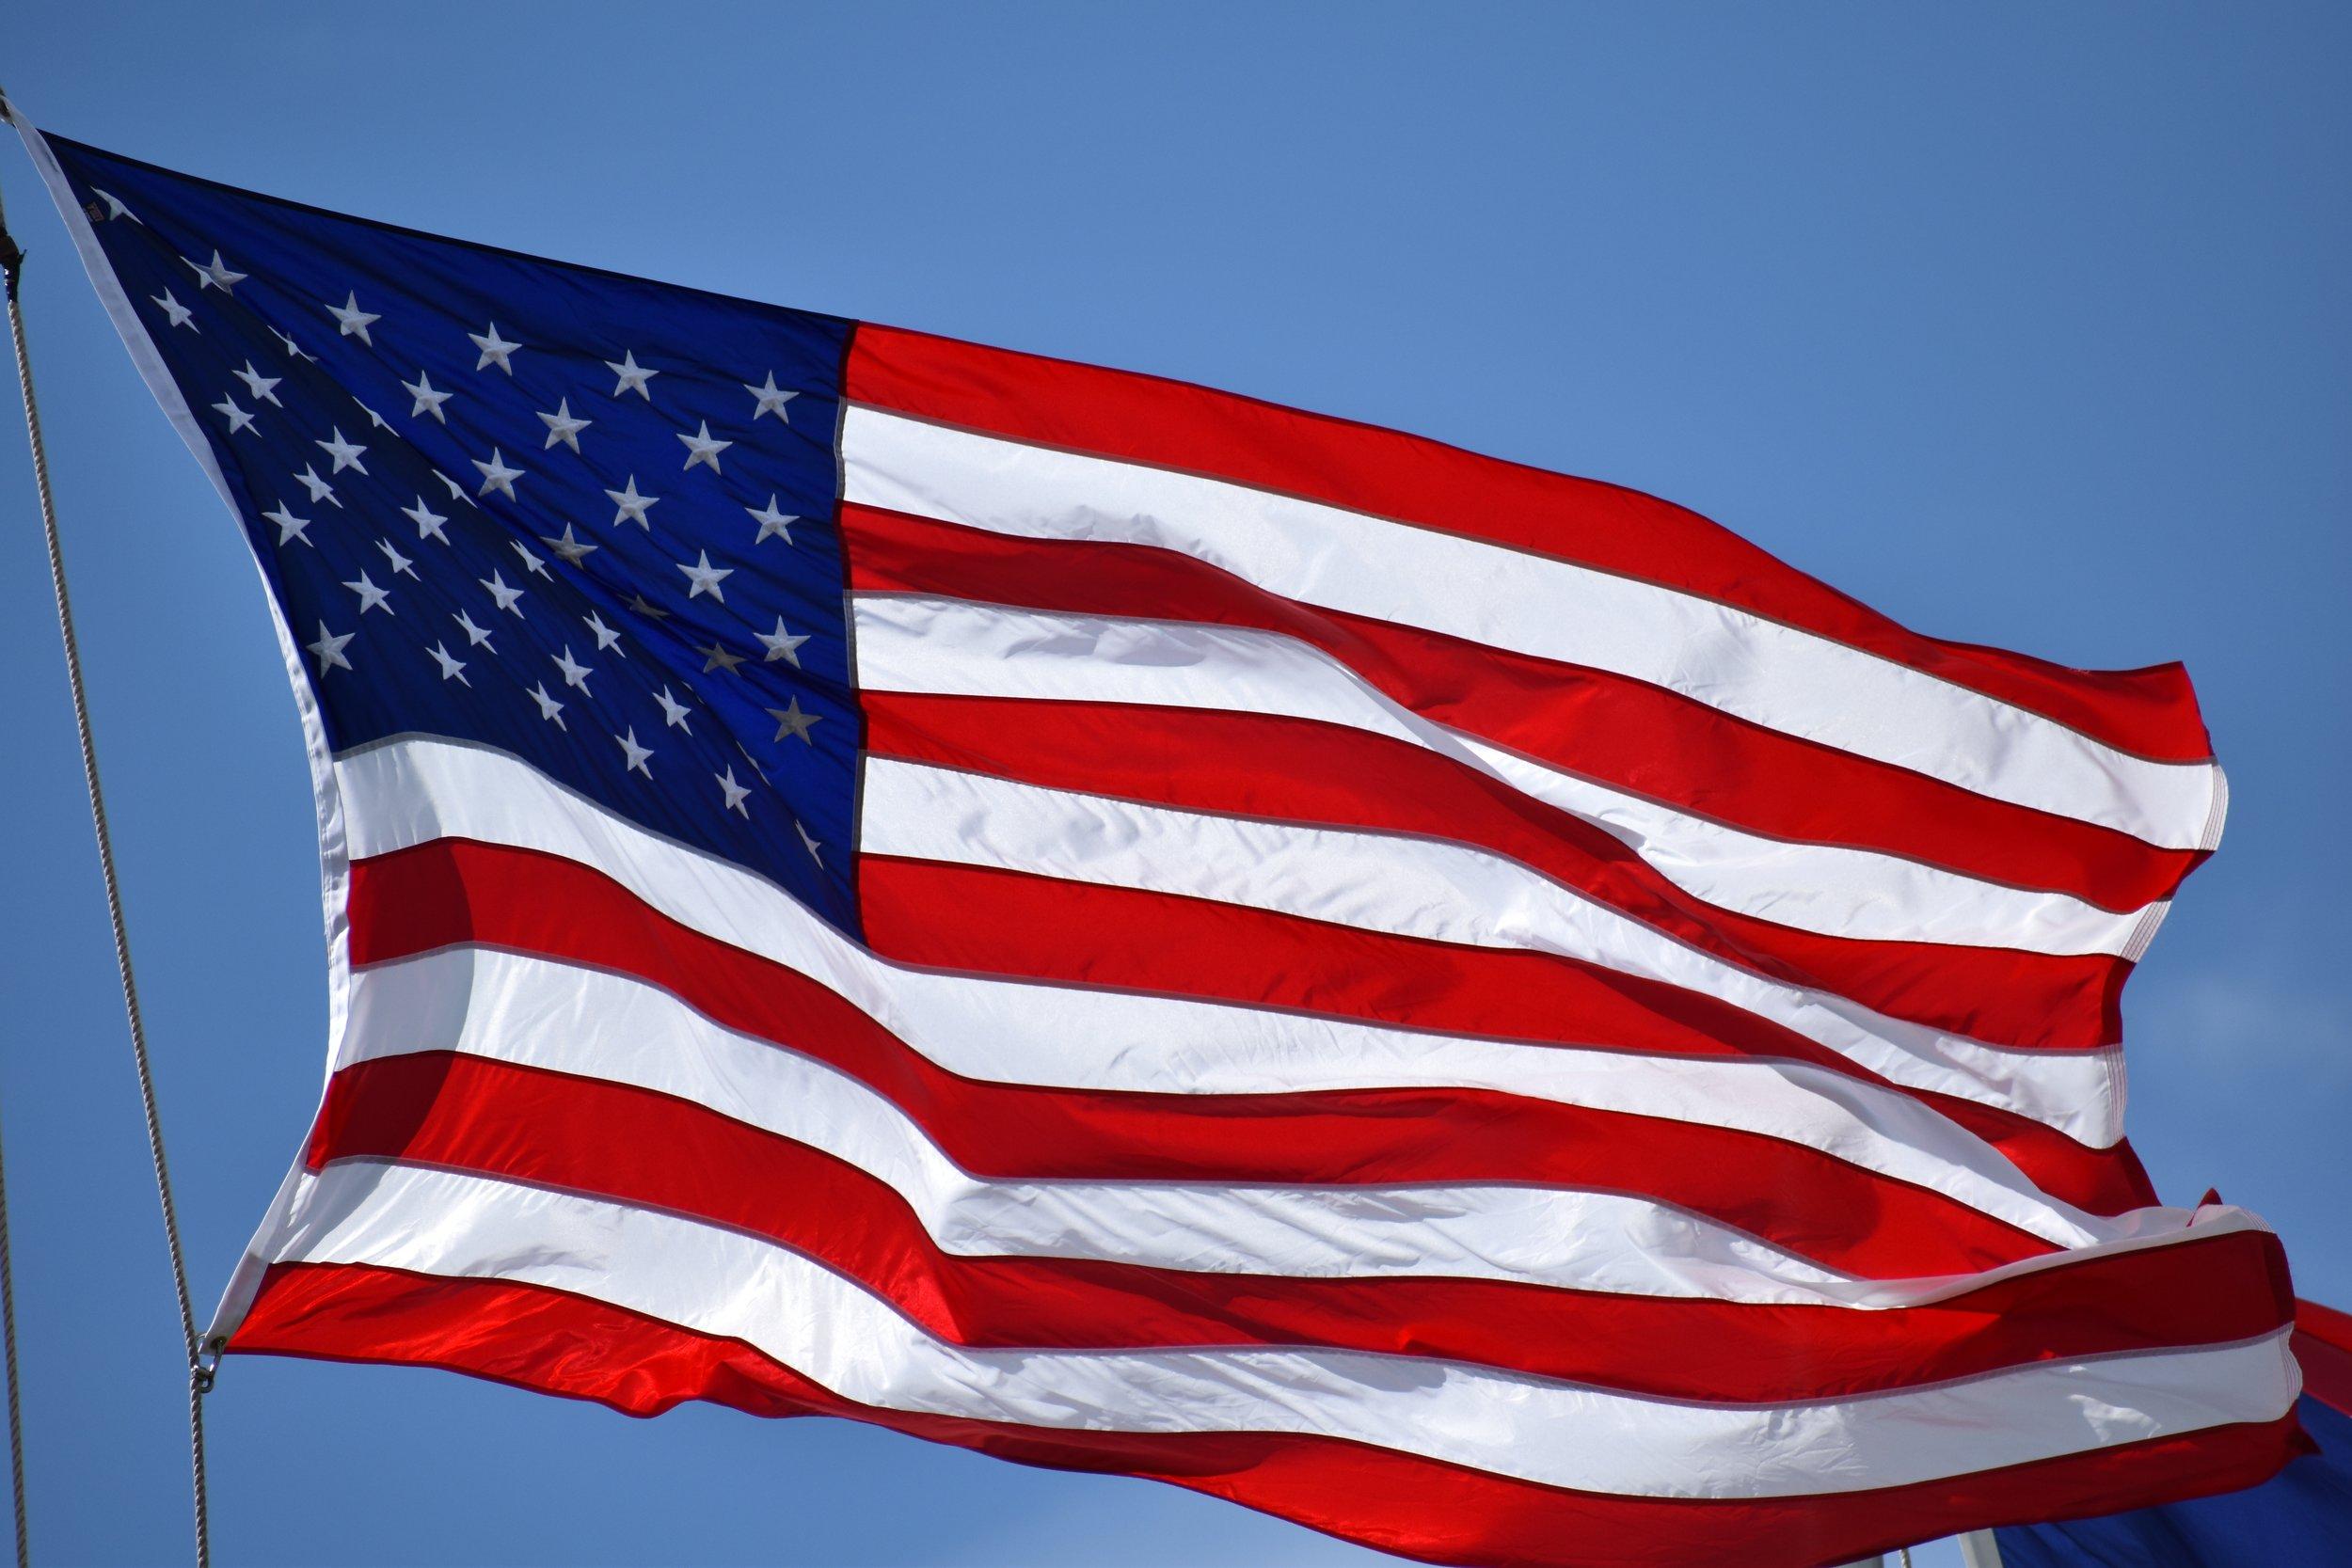 american flag from unsplash